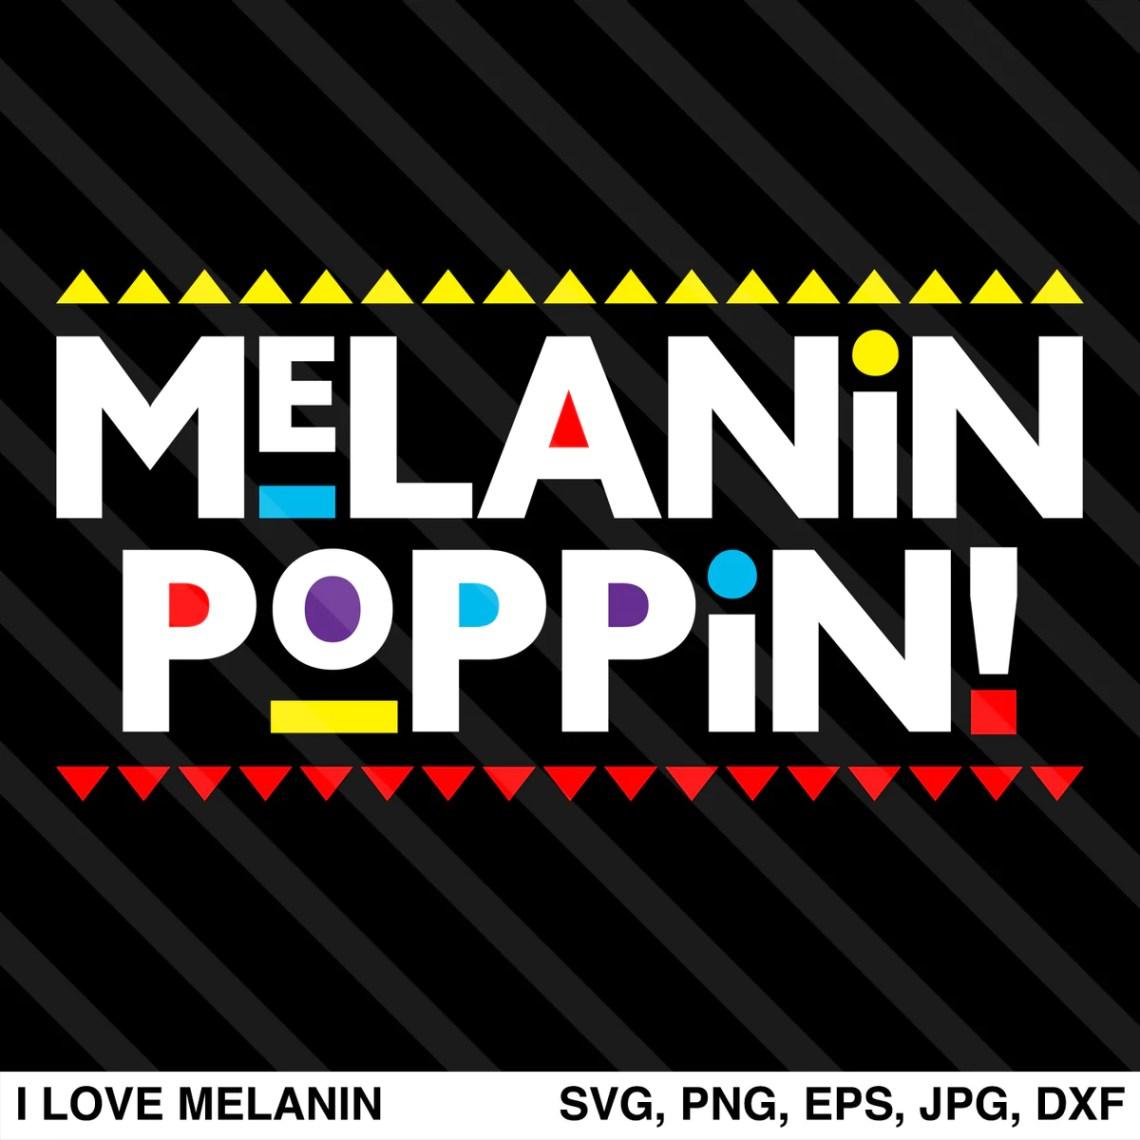 Download Melanin Poppin SVG - I Love Melanin